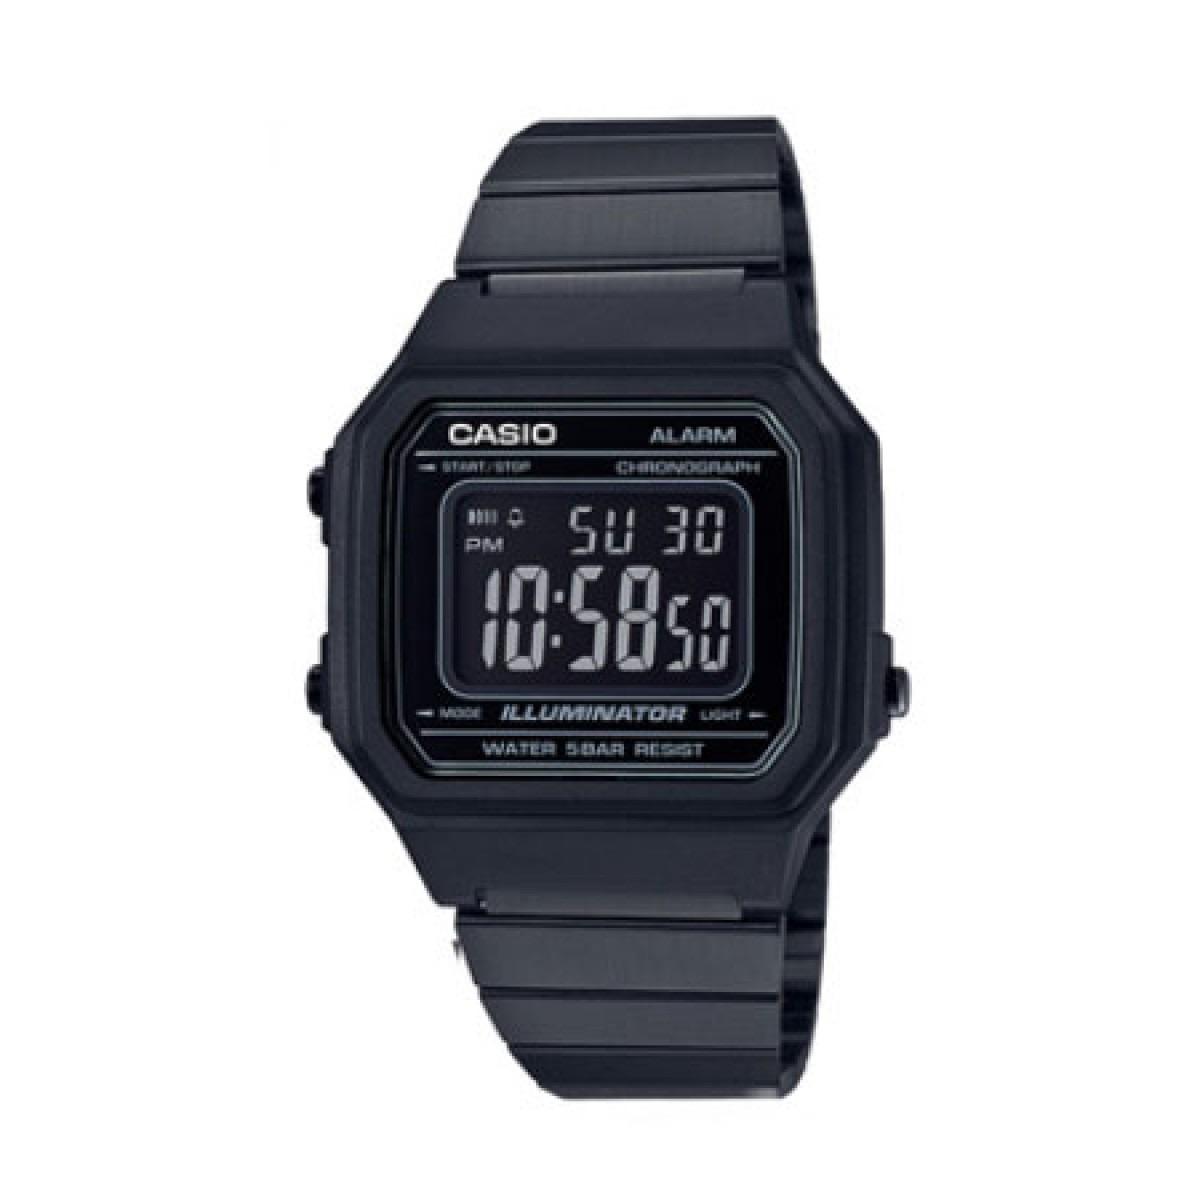 02bf50e6bf2f relógio casio - illuminator - preto - b650wb-1bdf. Carregando zoom.